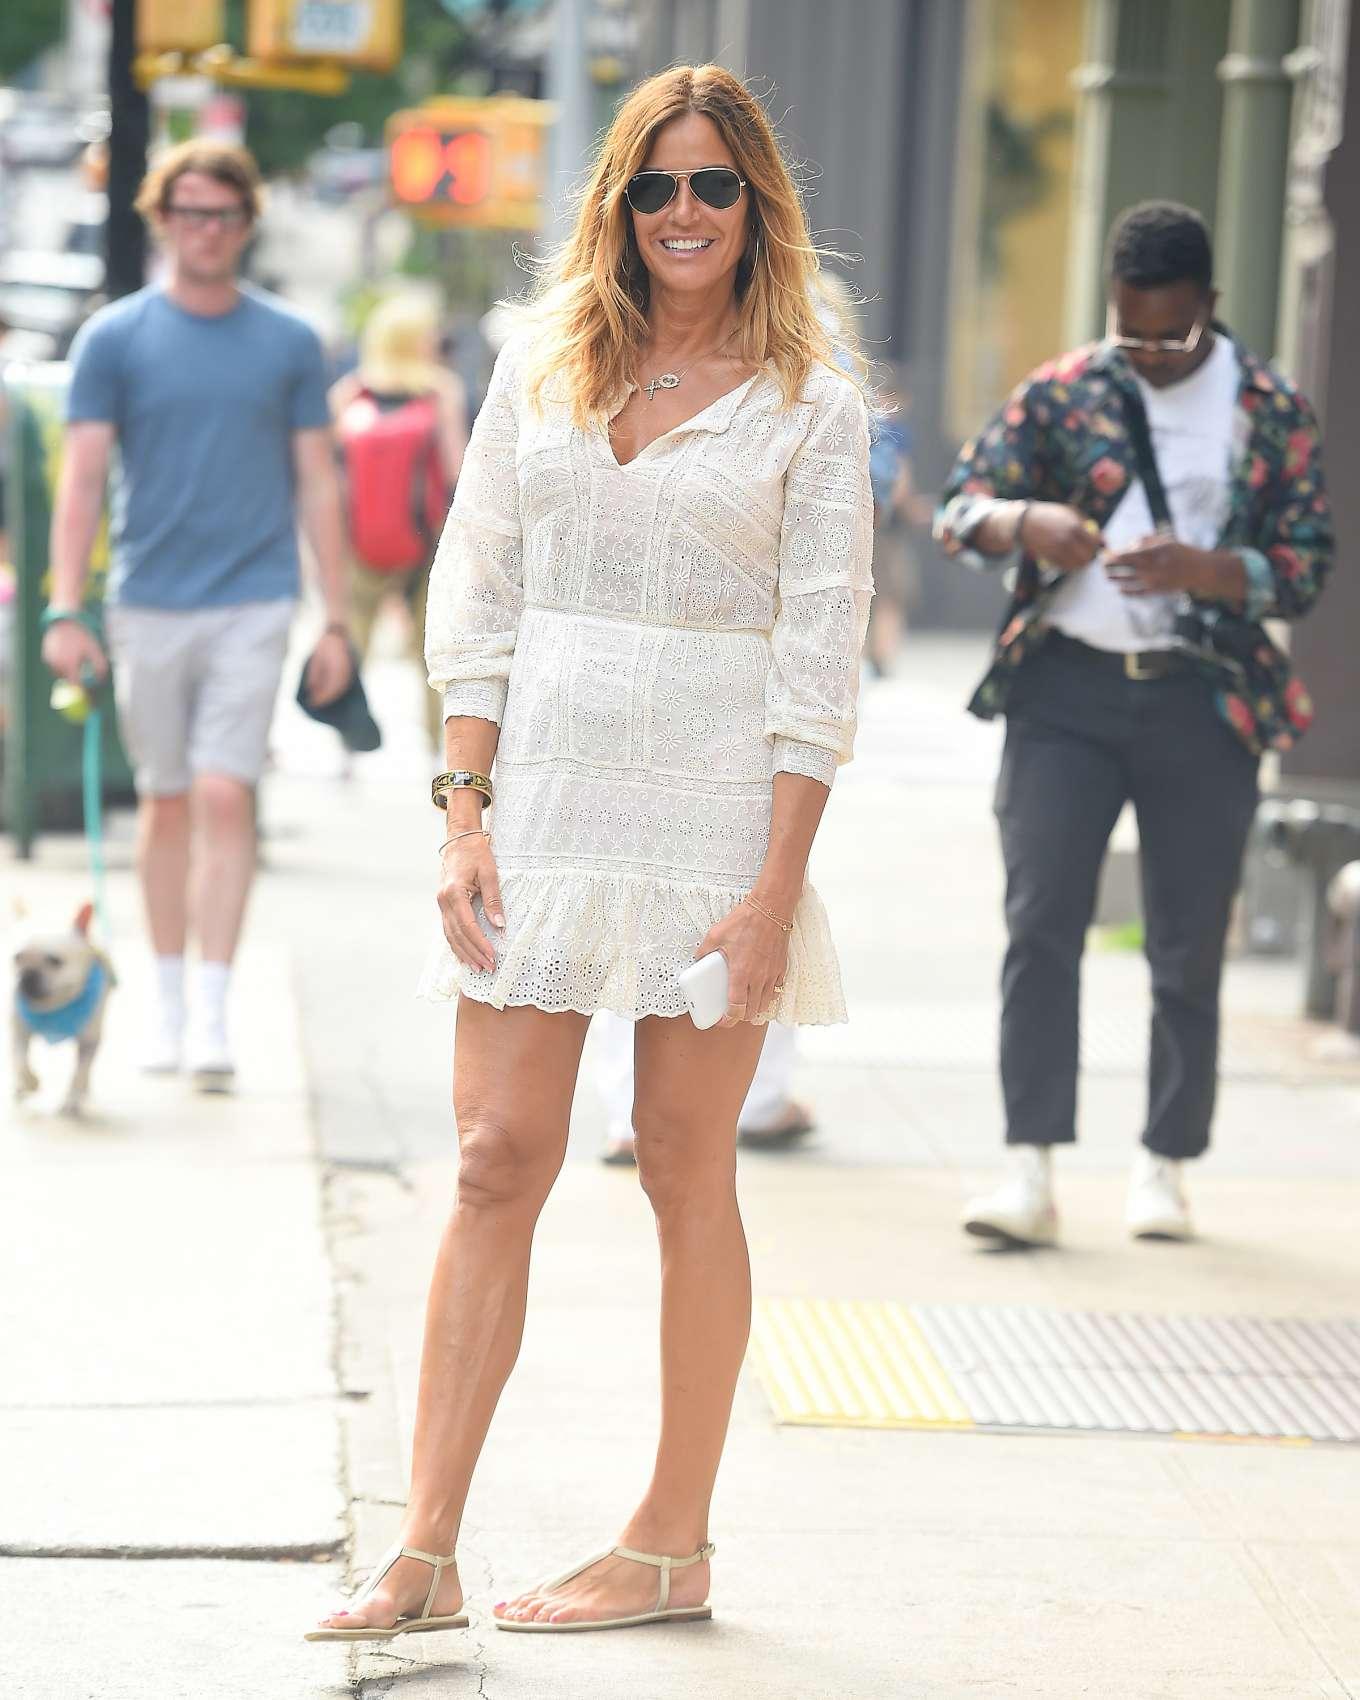 Kelly Bensimon in Mini Dress - Out in Soho, New York